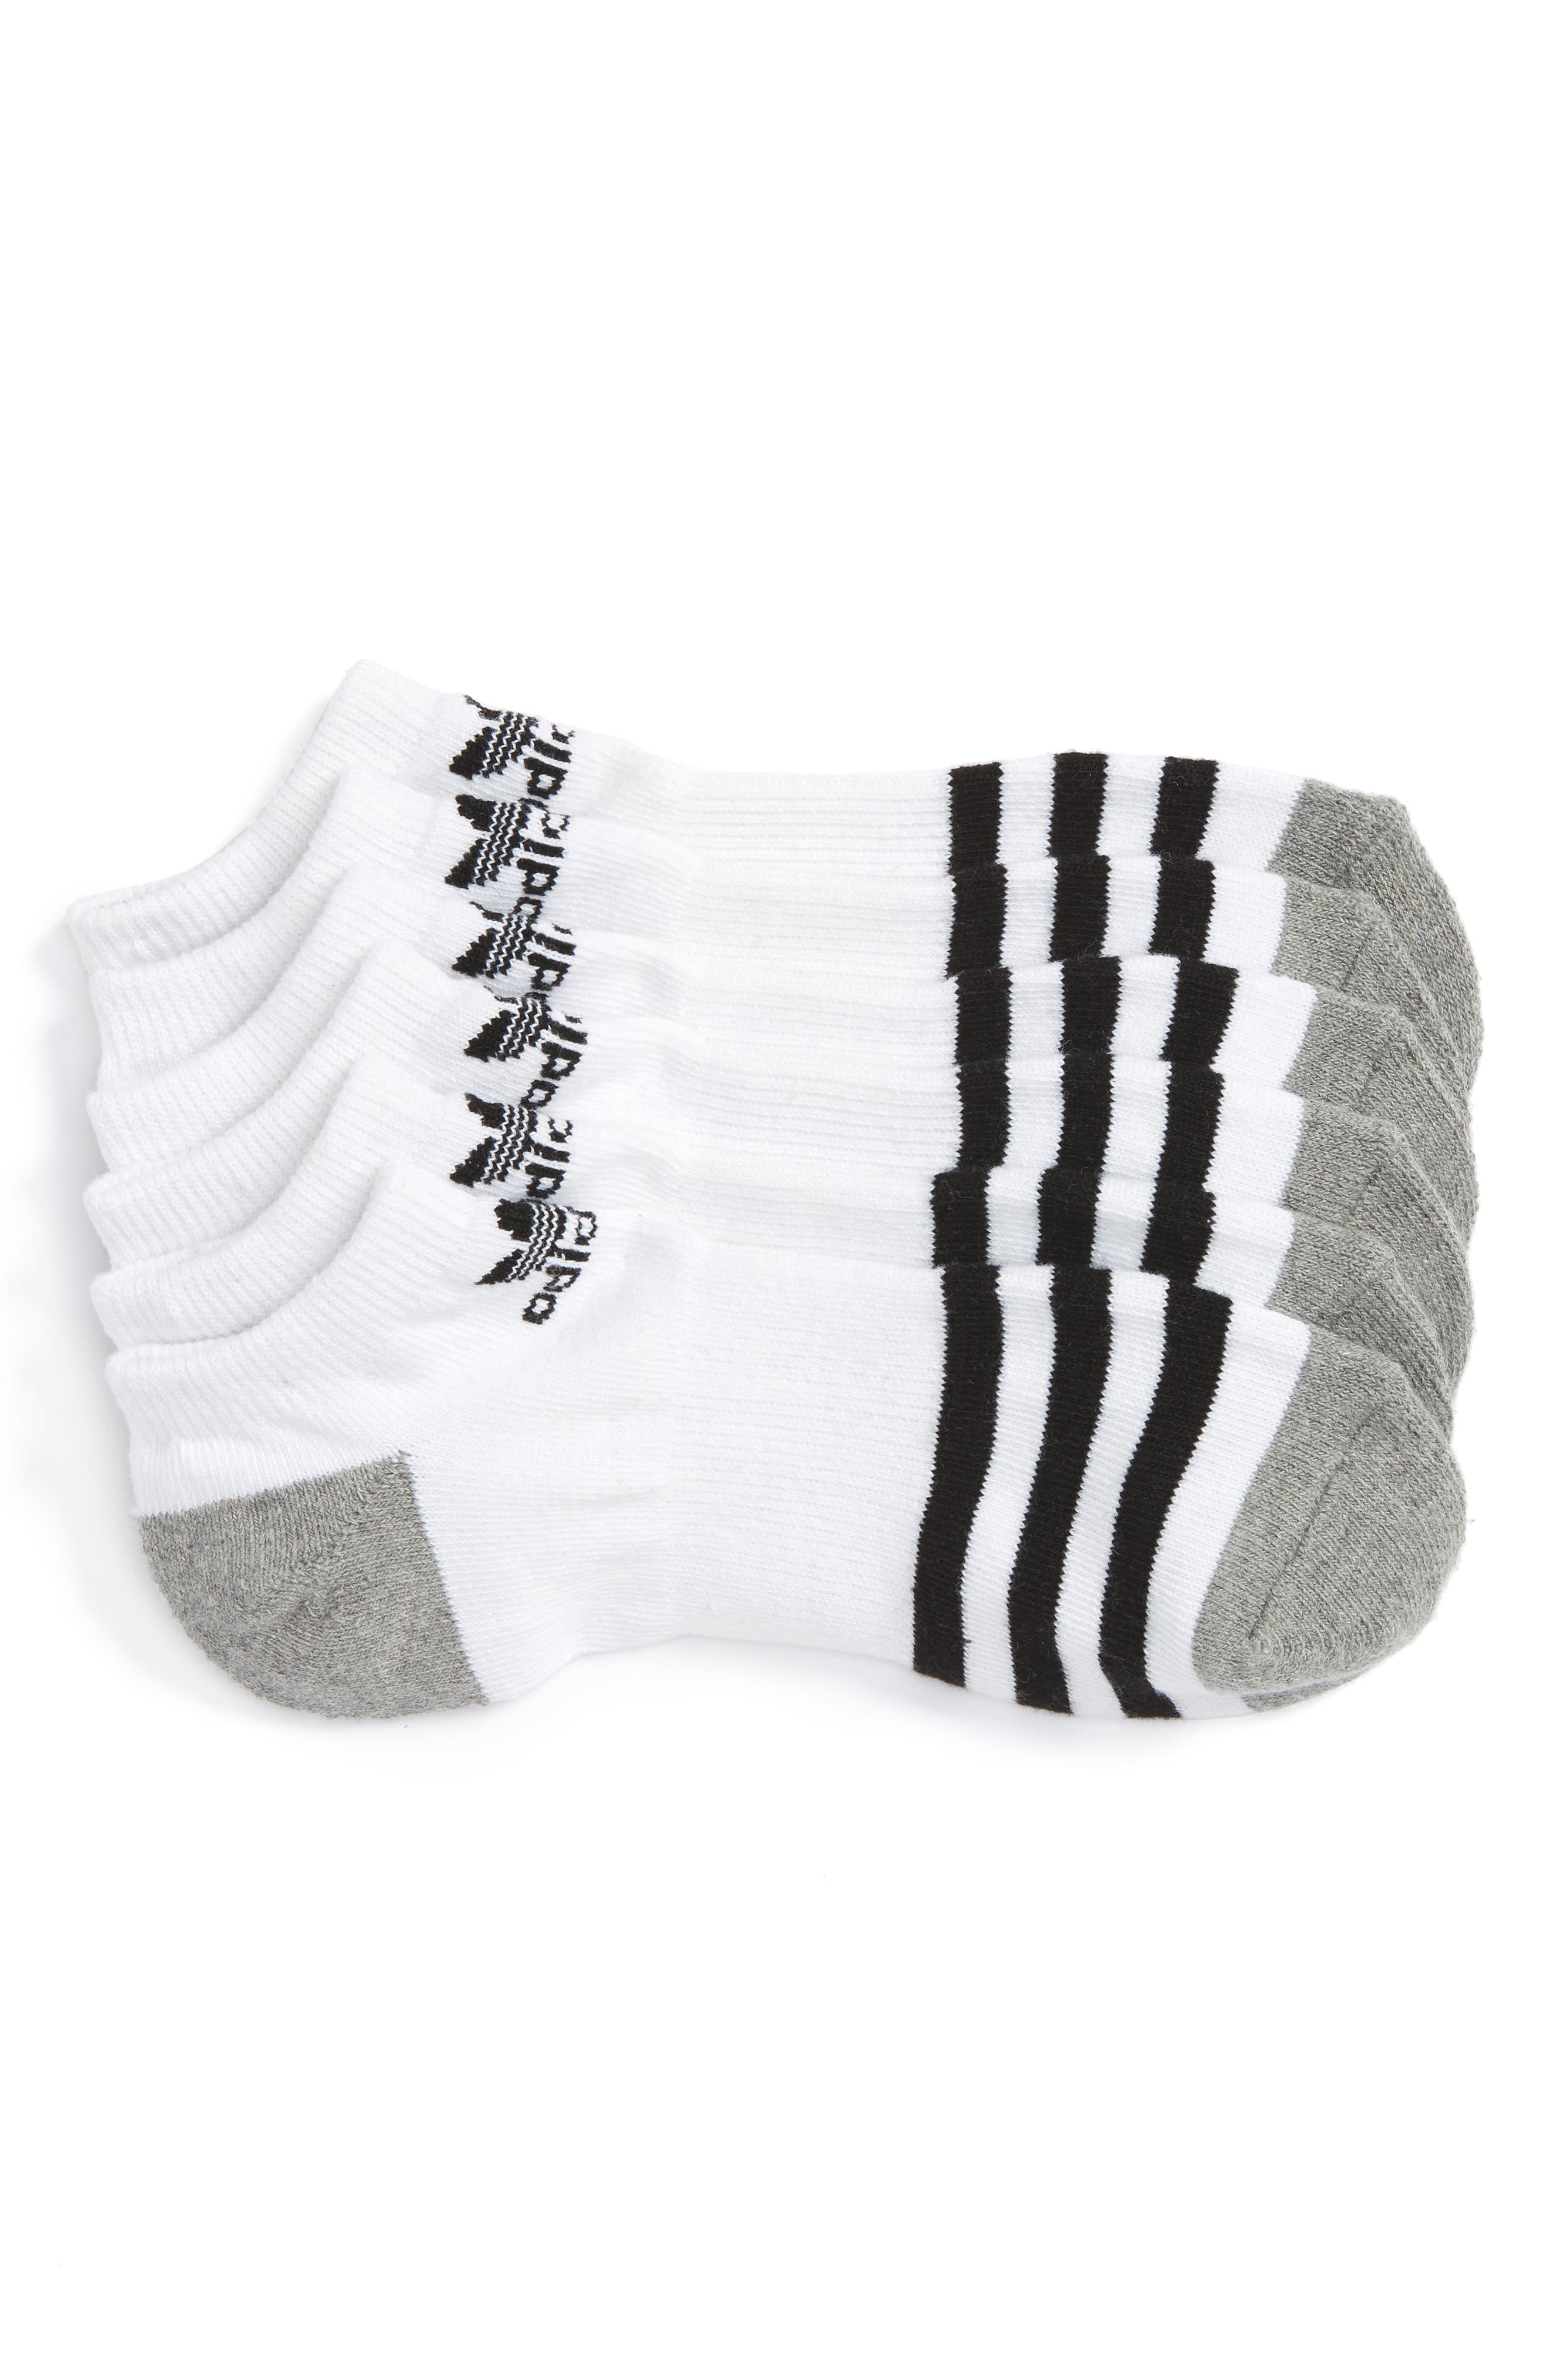 3-Pack Original Cushioned No-Show Socks,                         Main,                         color, White/ Black/ White